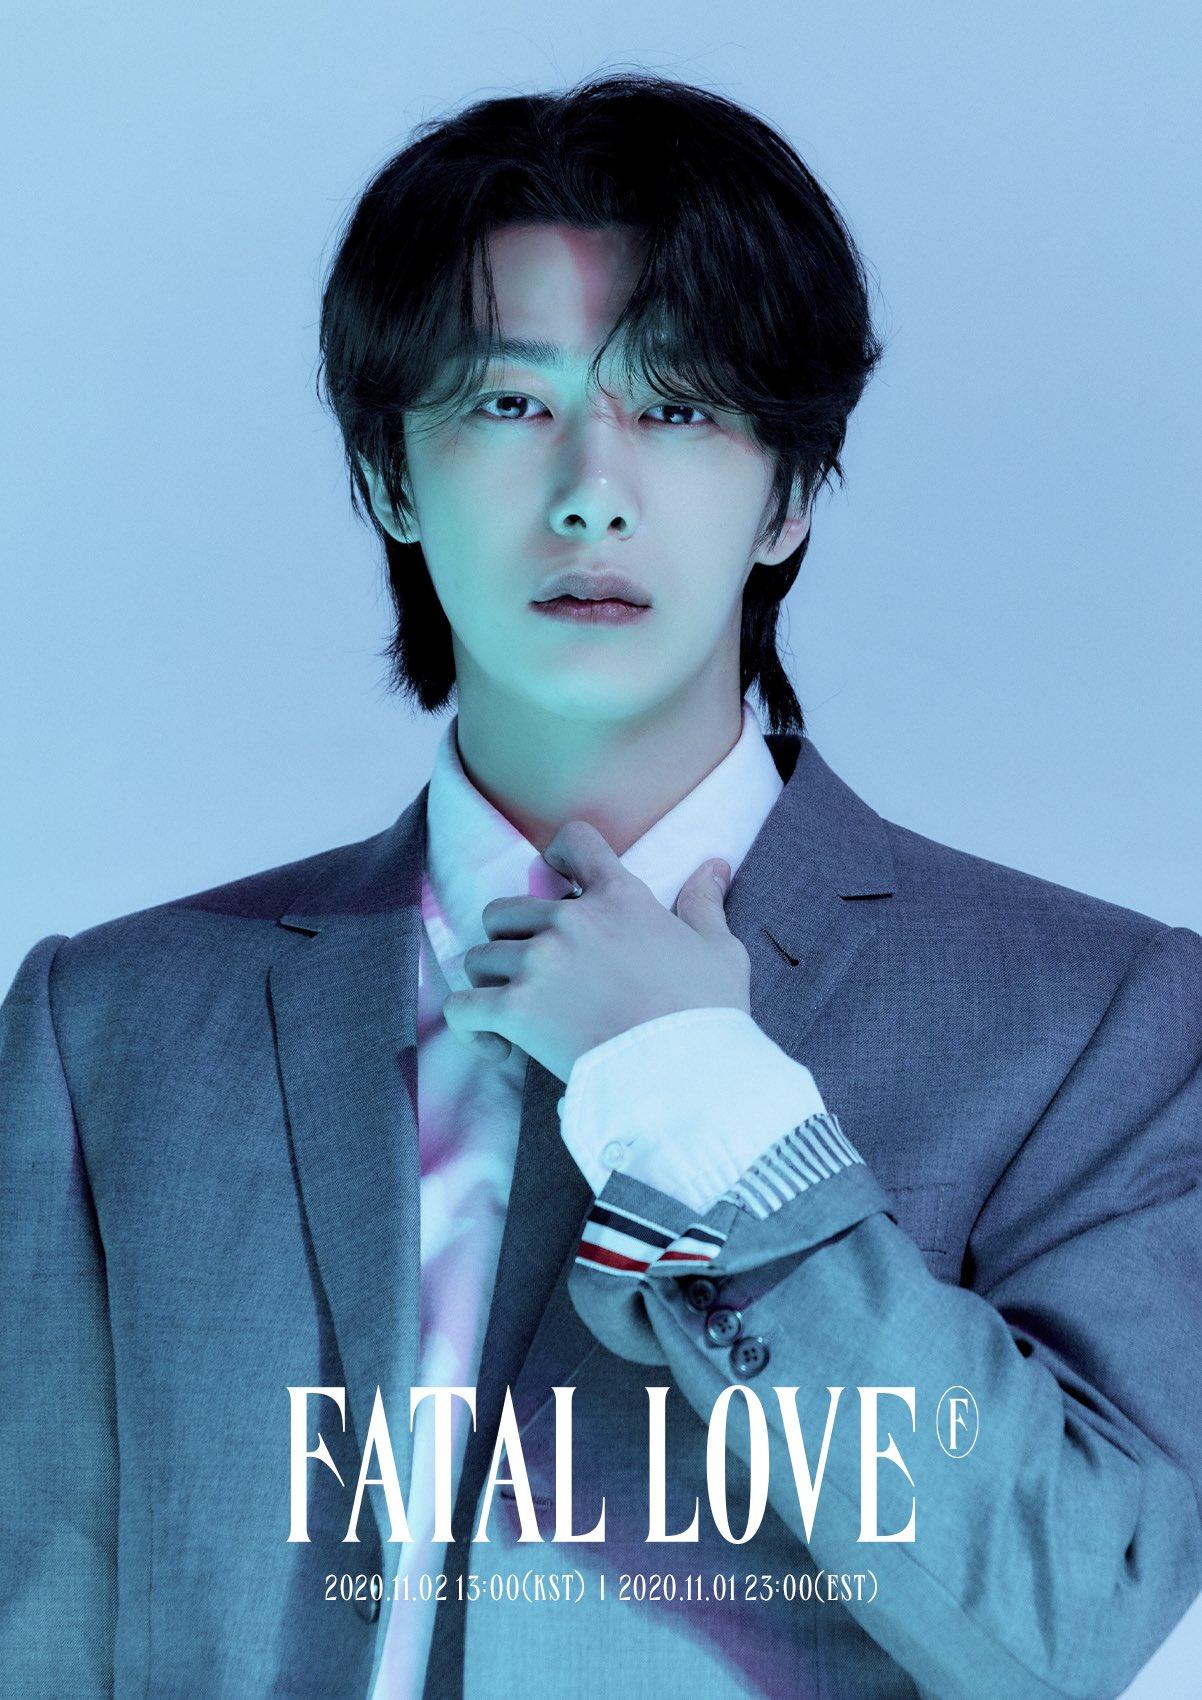 Update Monsta X Shares Sneak Peek Of Upcoming Album Fatal Love Soompi